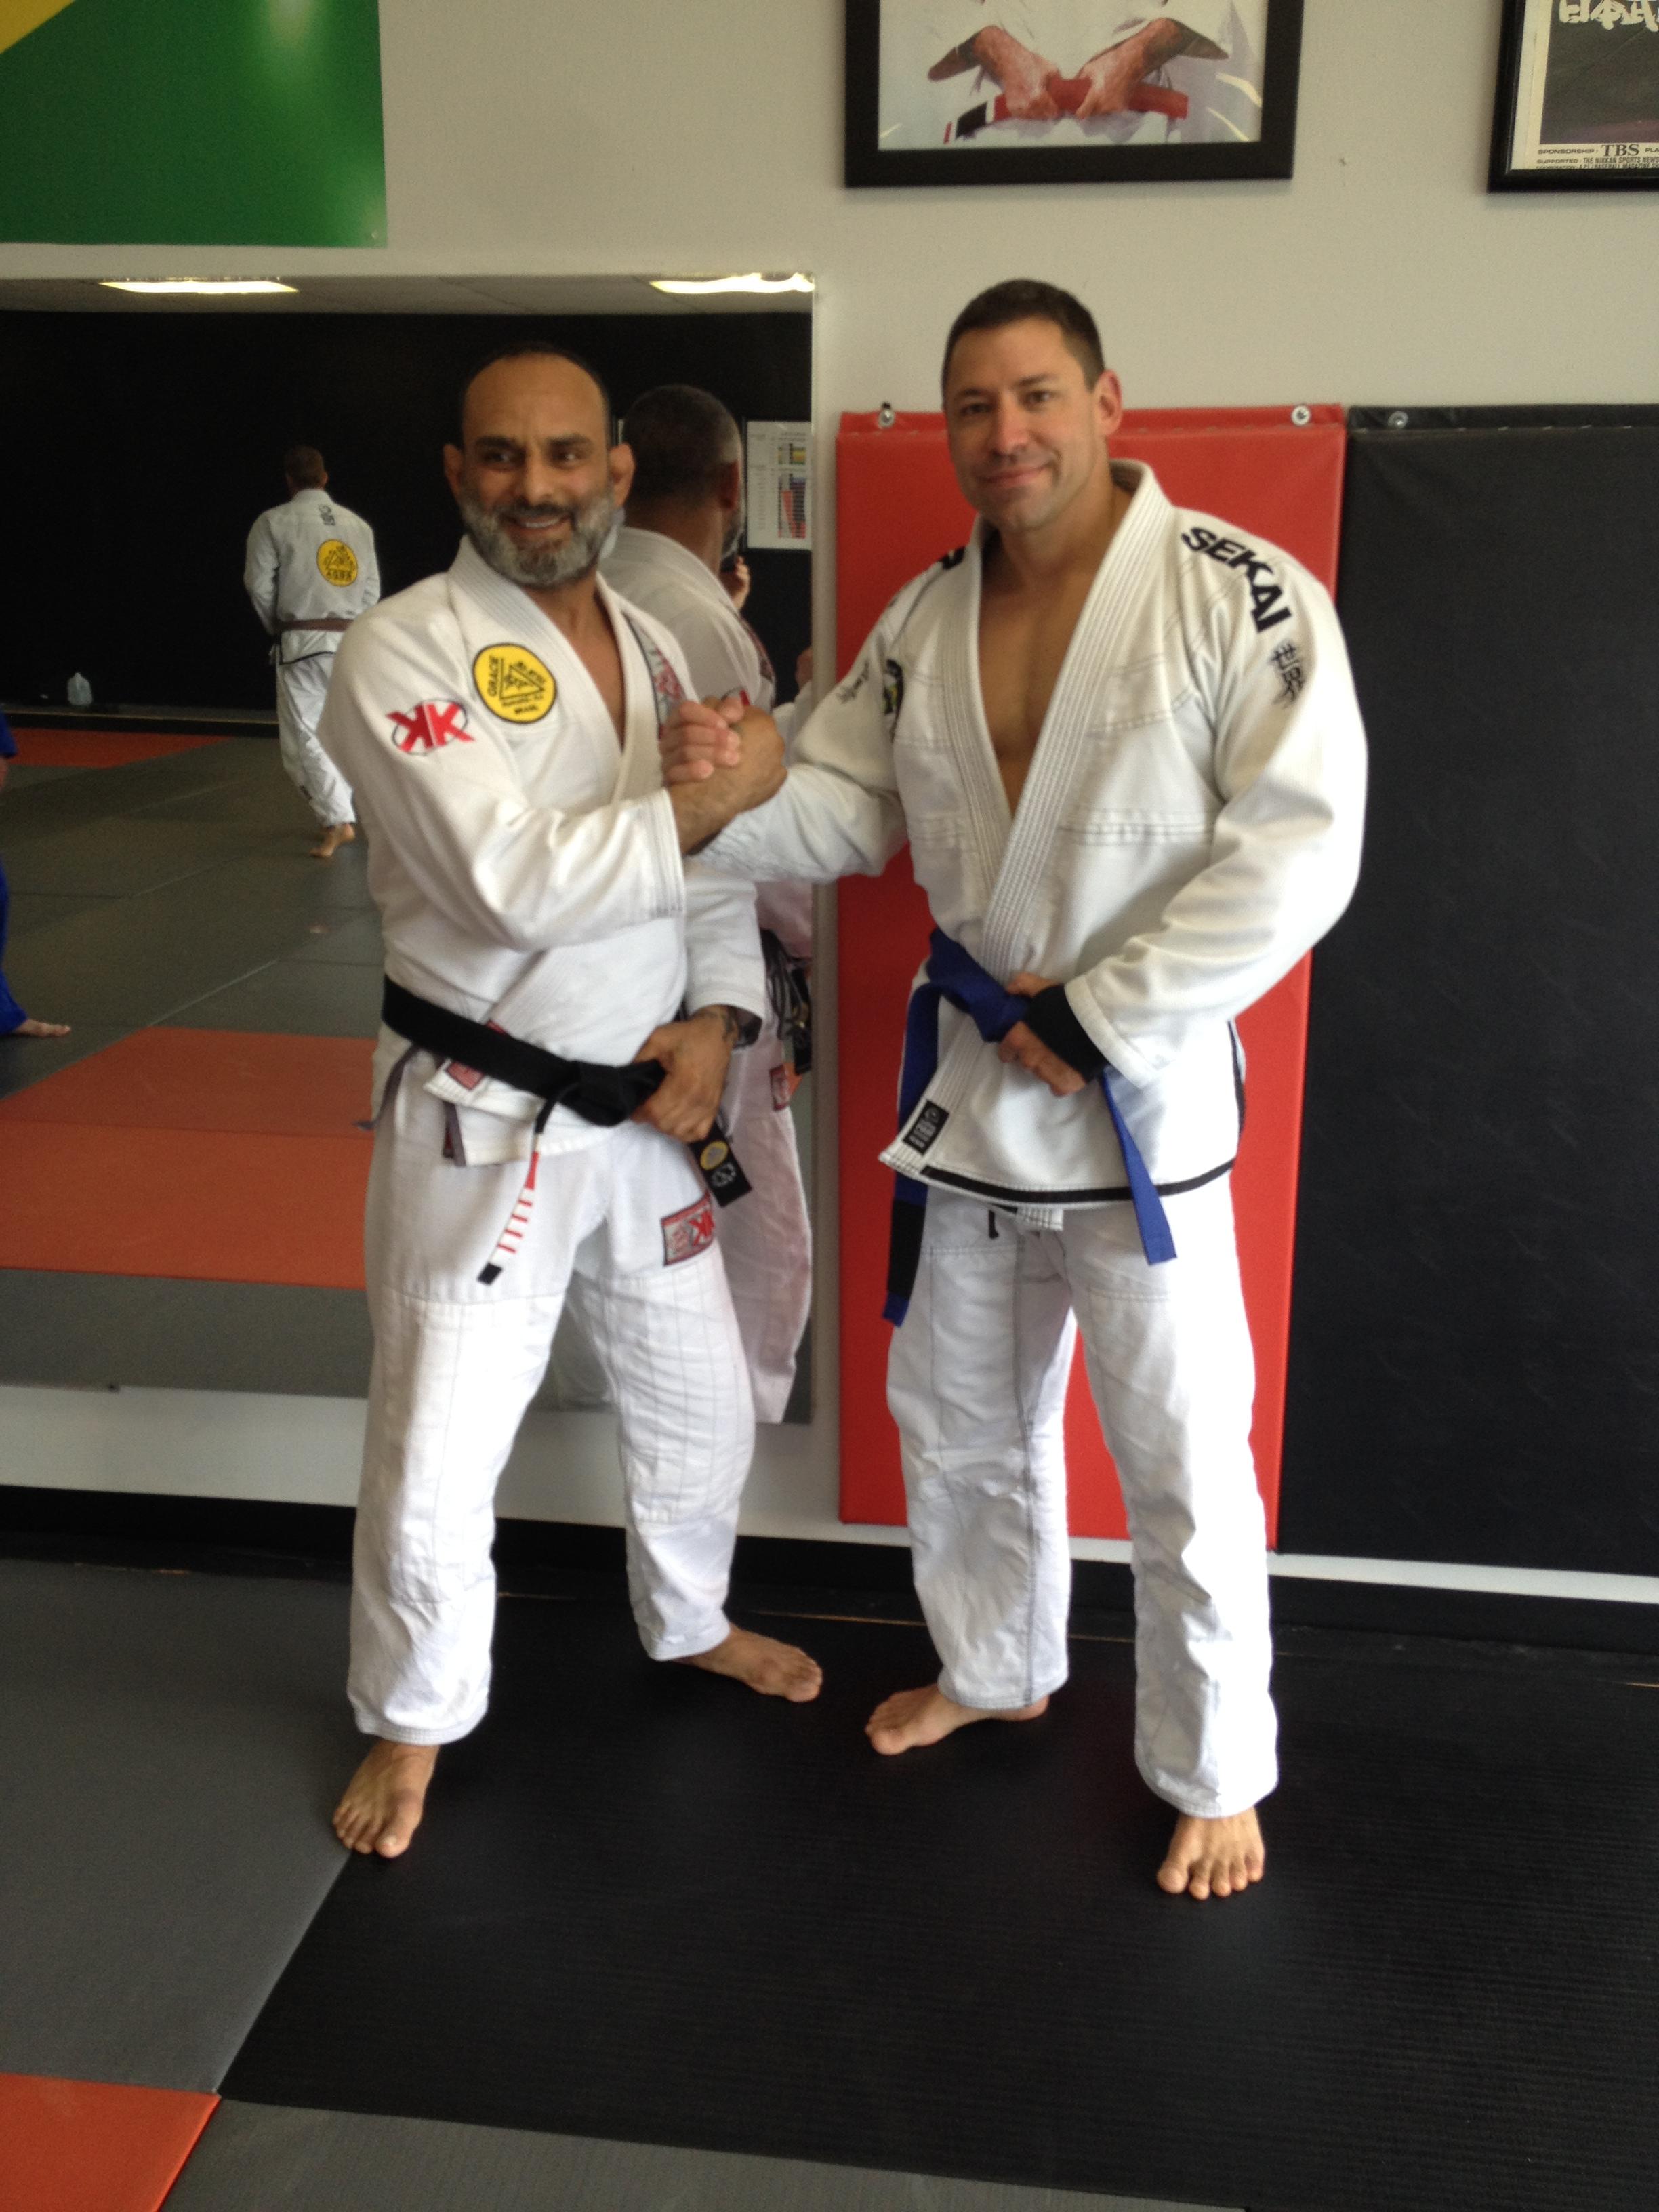 David Adiv and Manny Reyna